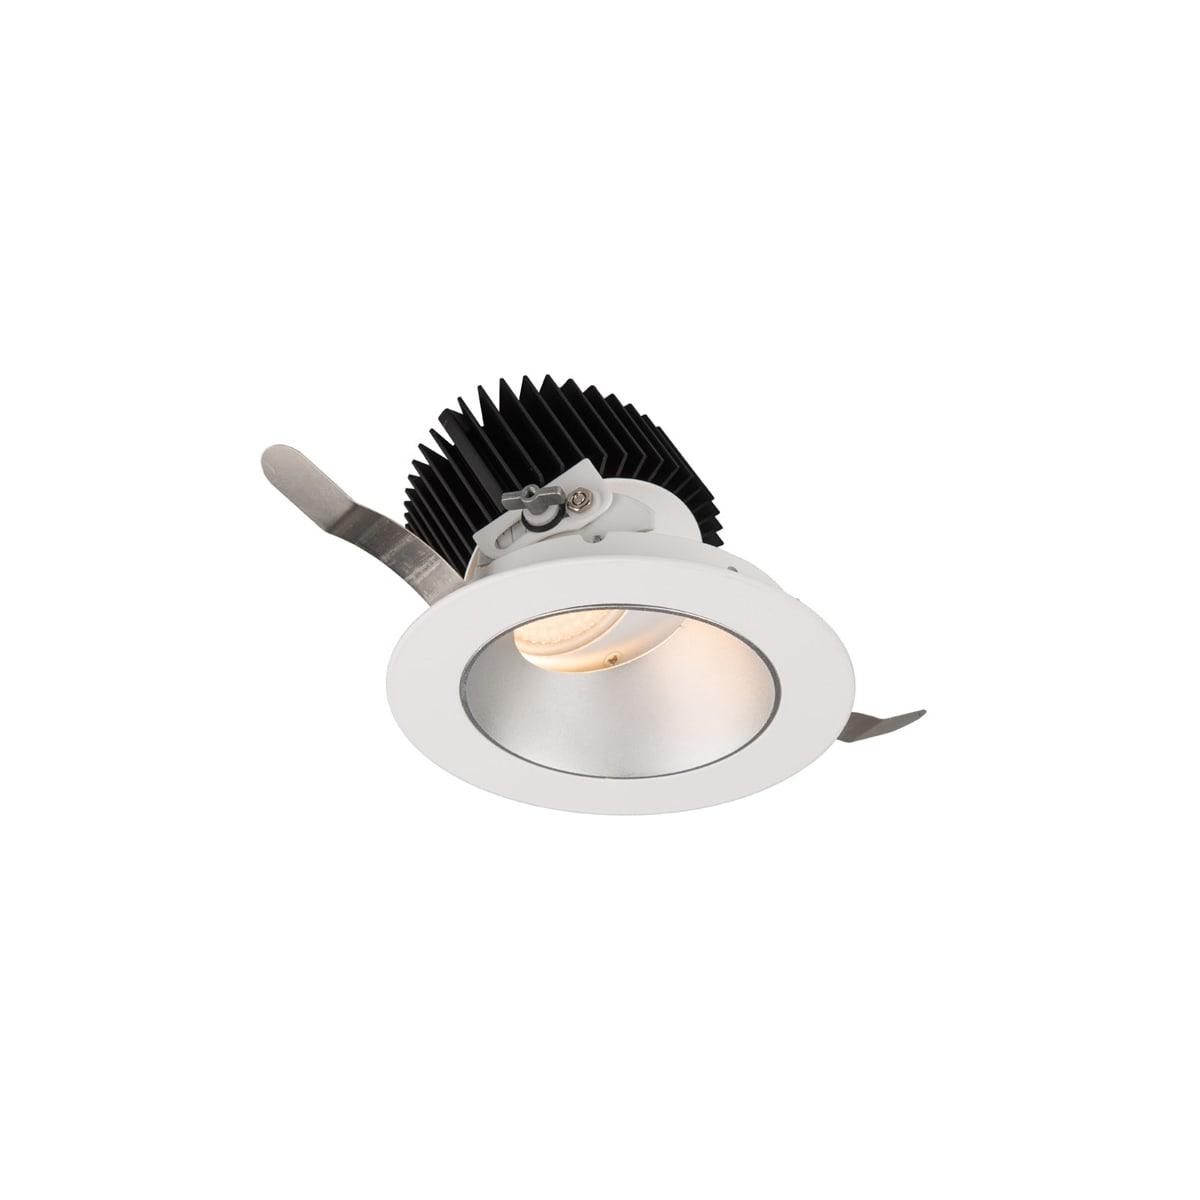 Wac Lighting R3arat N827 Hzwt Haze White 2700k 85cri Aether 3 5 Round Adjustable Trim With Led Light Engine And 25 Degree Narrow Beam Spread Lightingshowplace Com